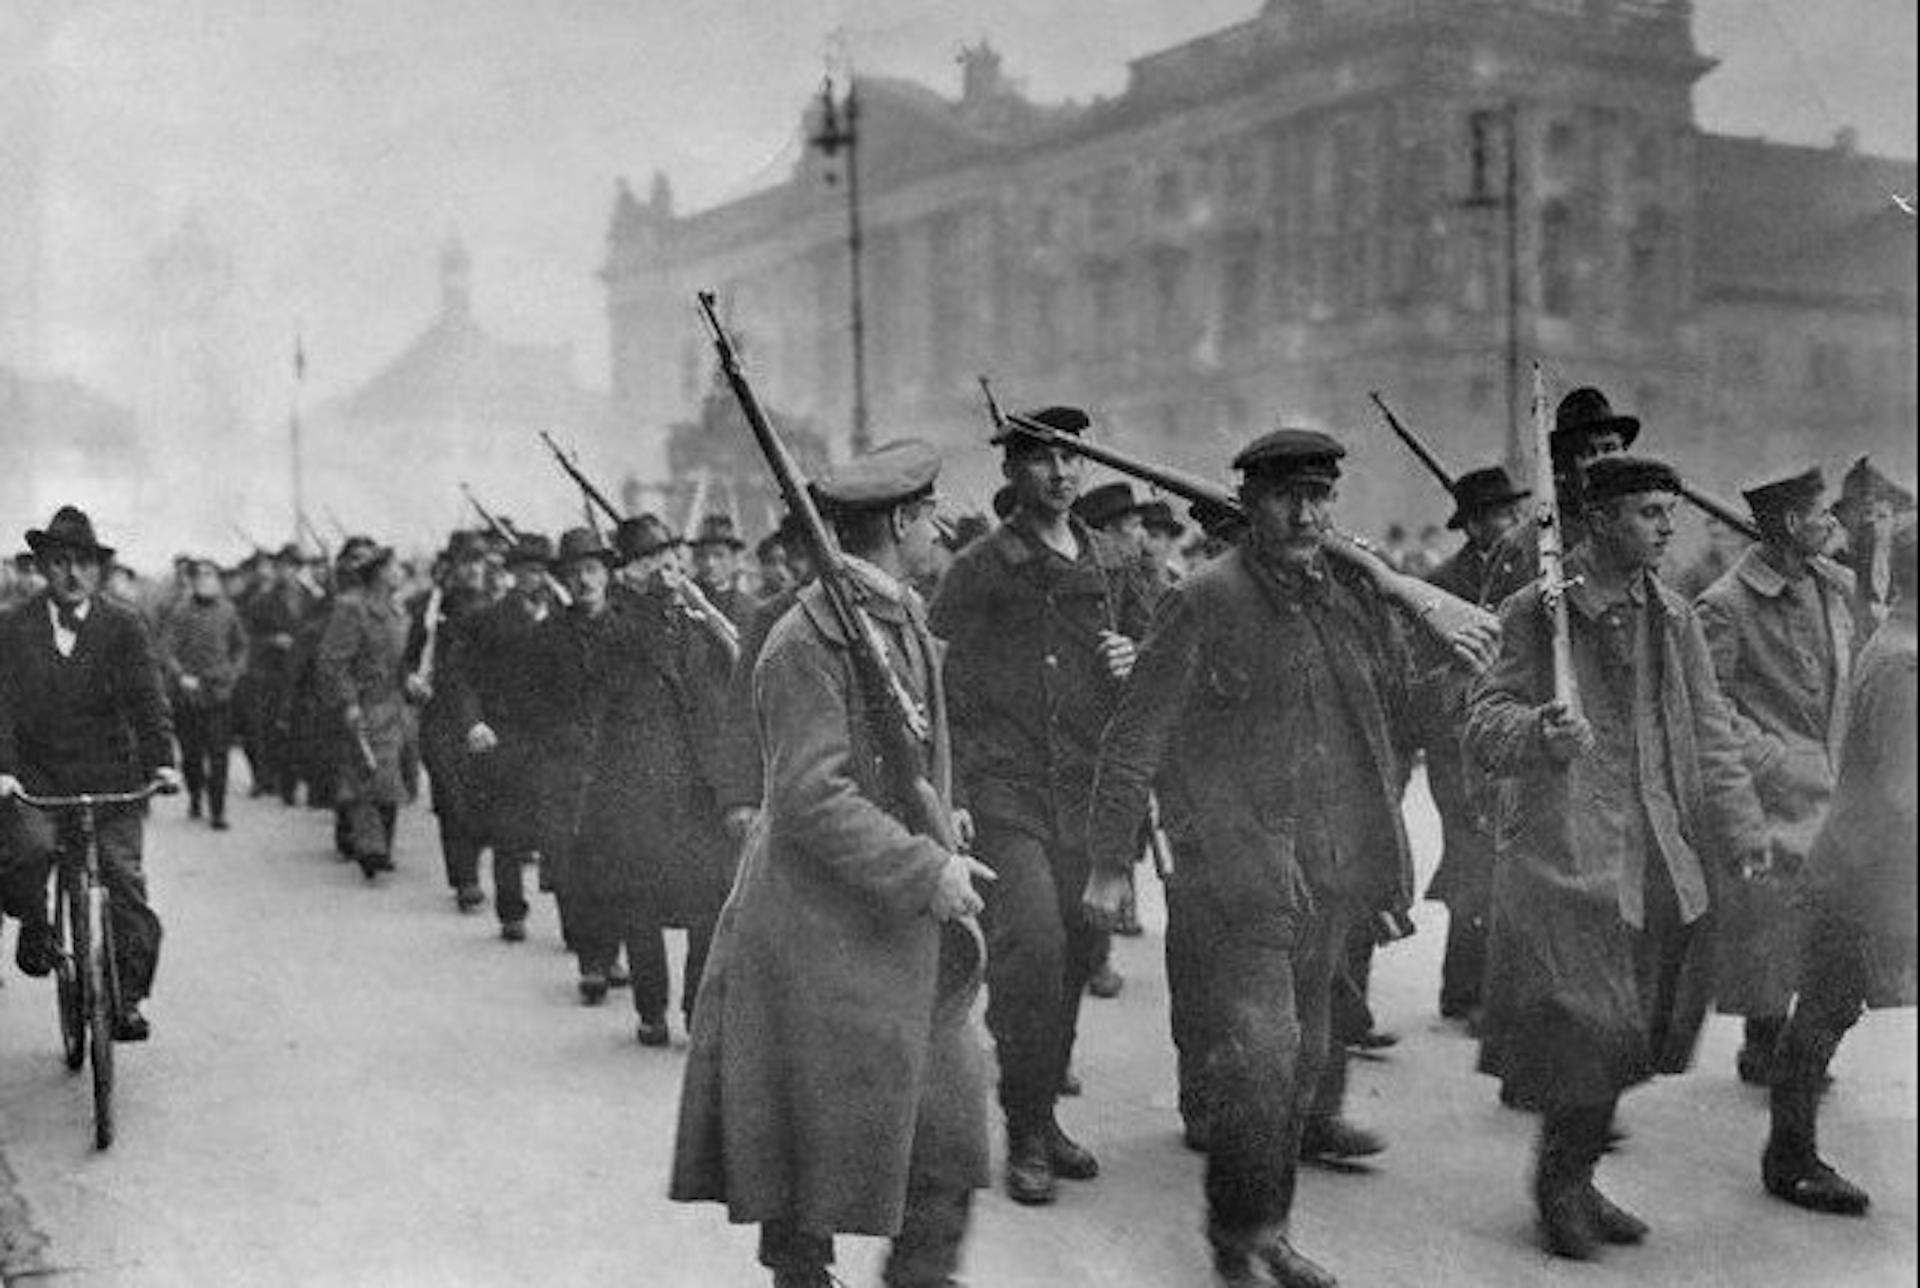 Workers protesting in Berlin, November 1918. Wikimedia